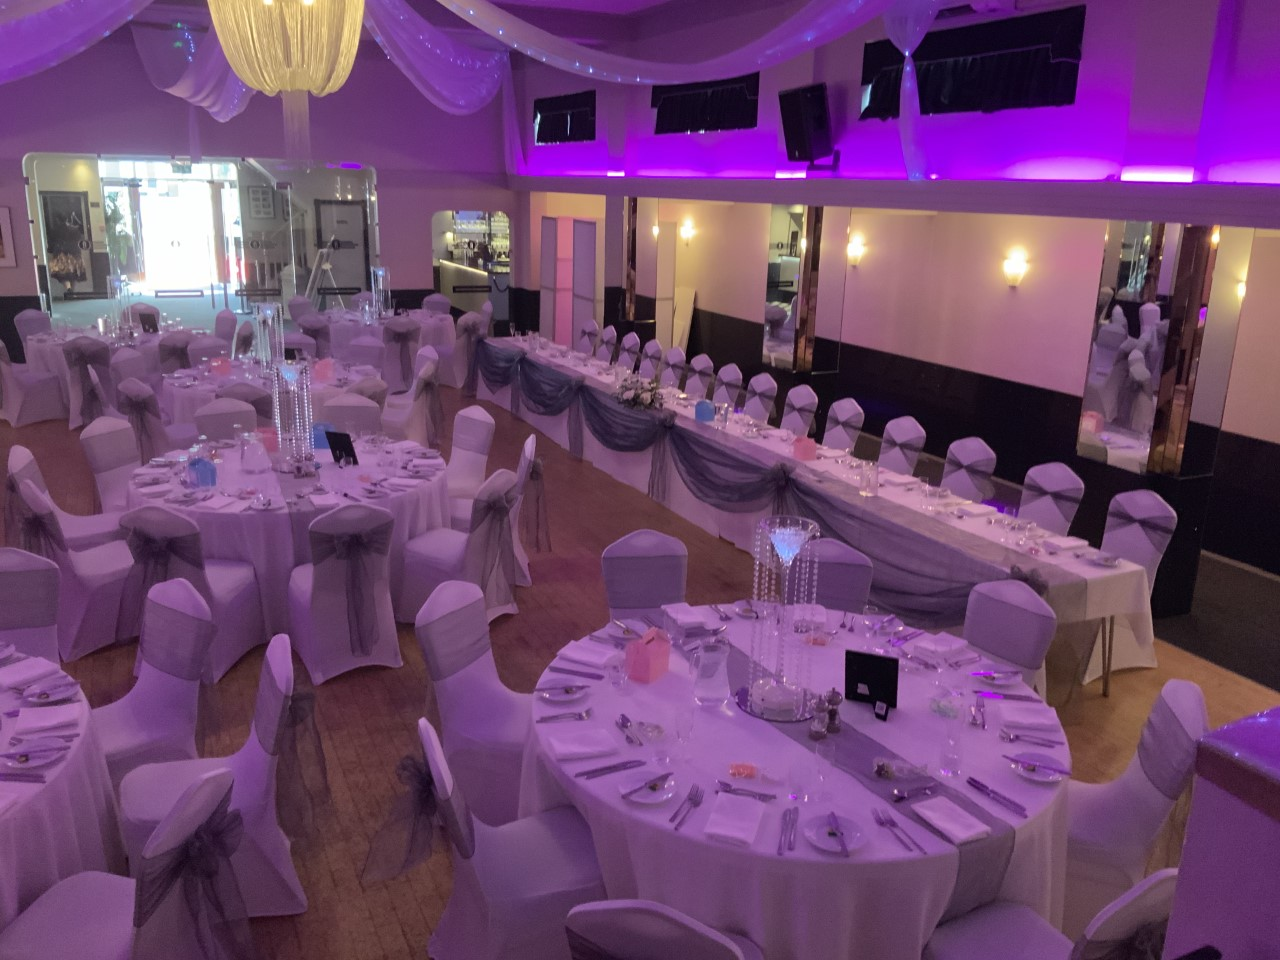 View of Ballroom - Rosie and Daniel - August 2019 - The Arlington Ballroom Essex